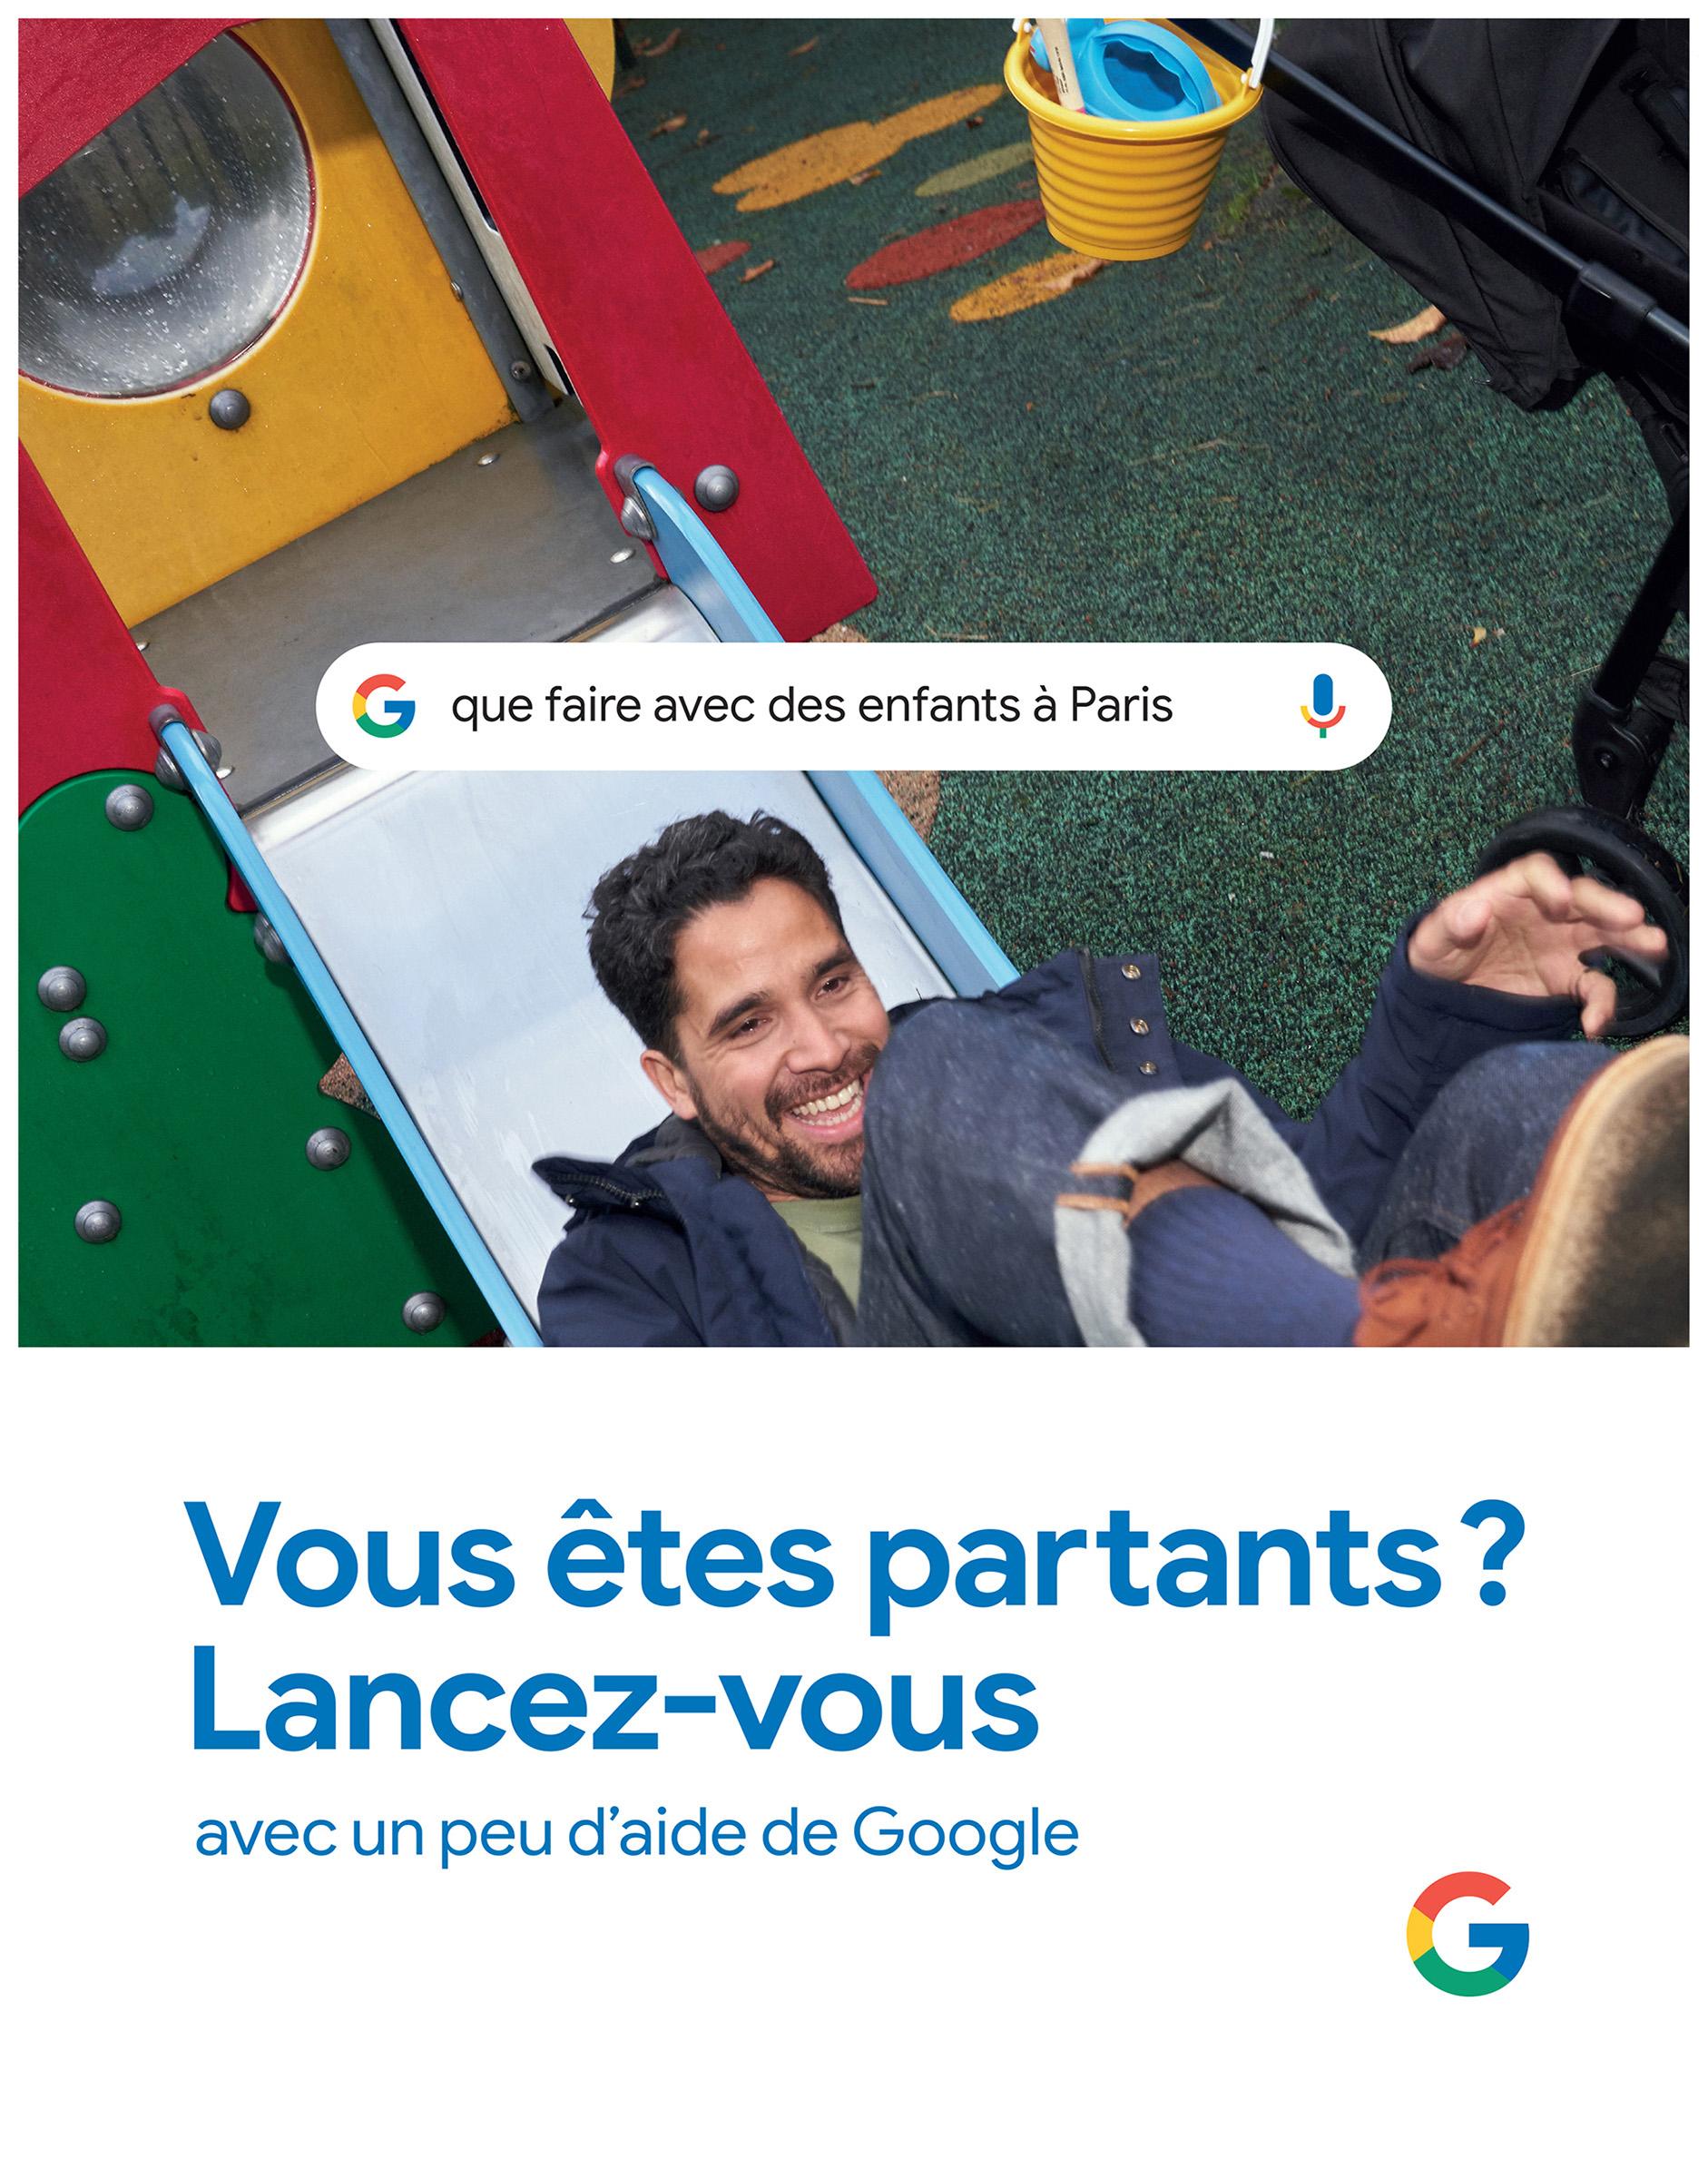 72andSunny_GoogleFrance_FigaroMagazine_Playground_210x272.indd